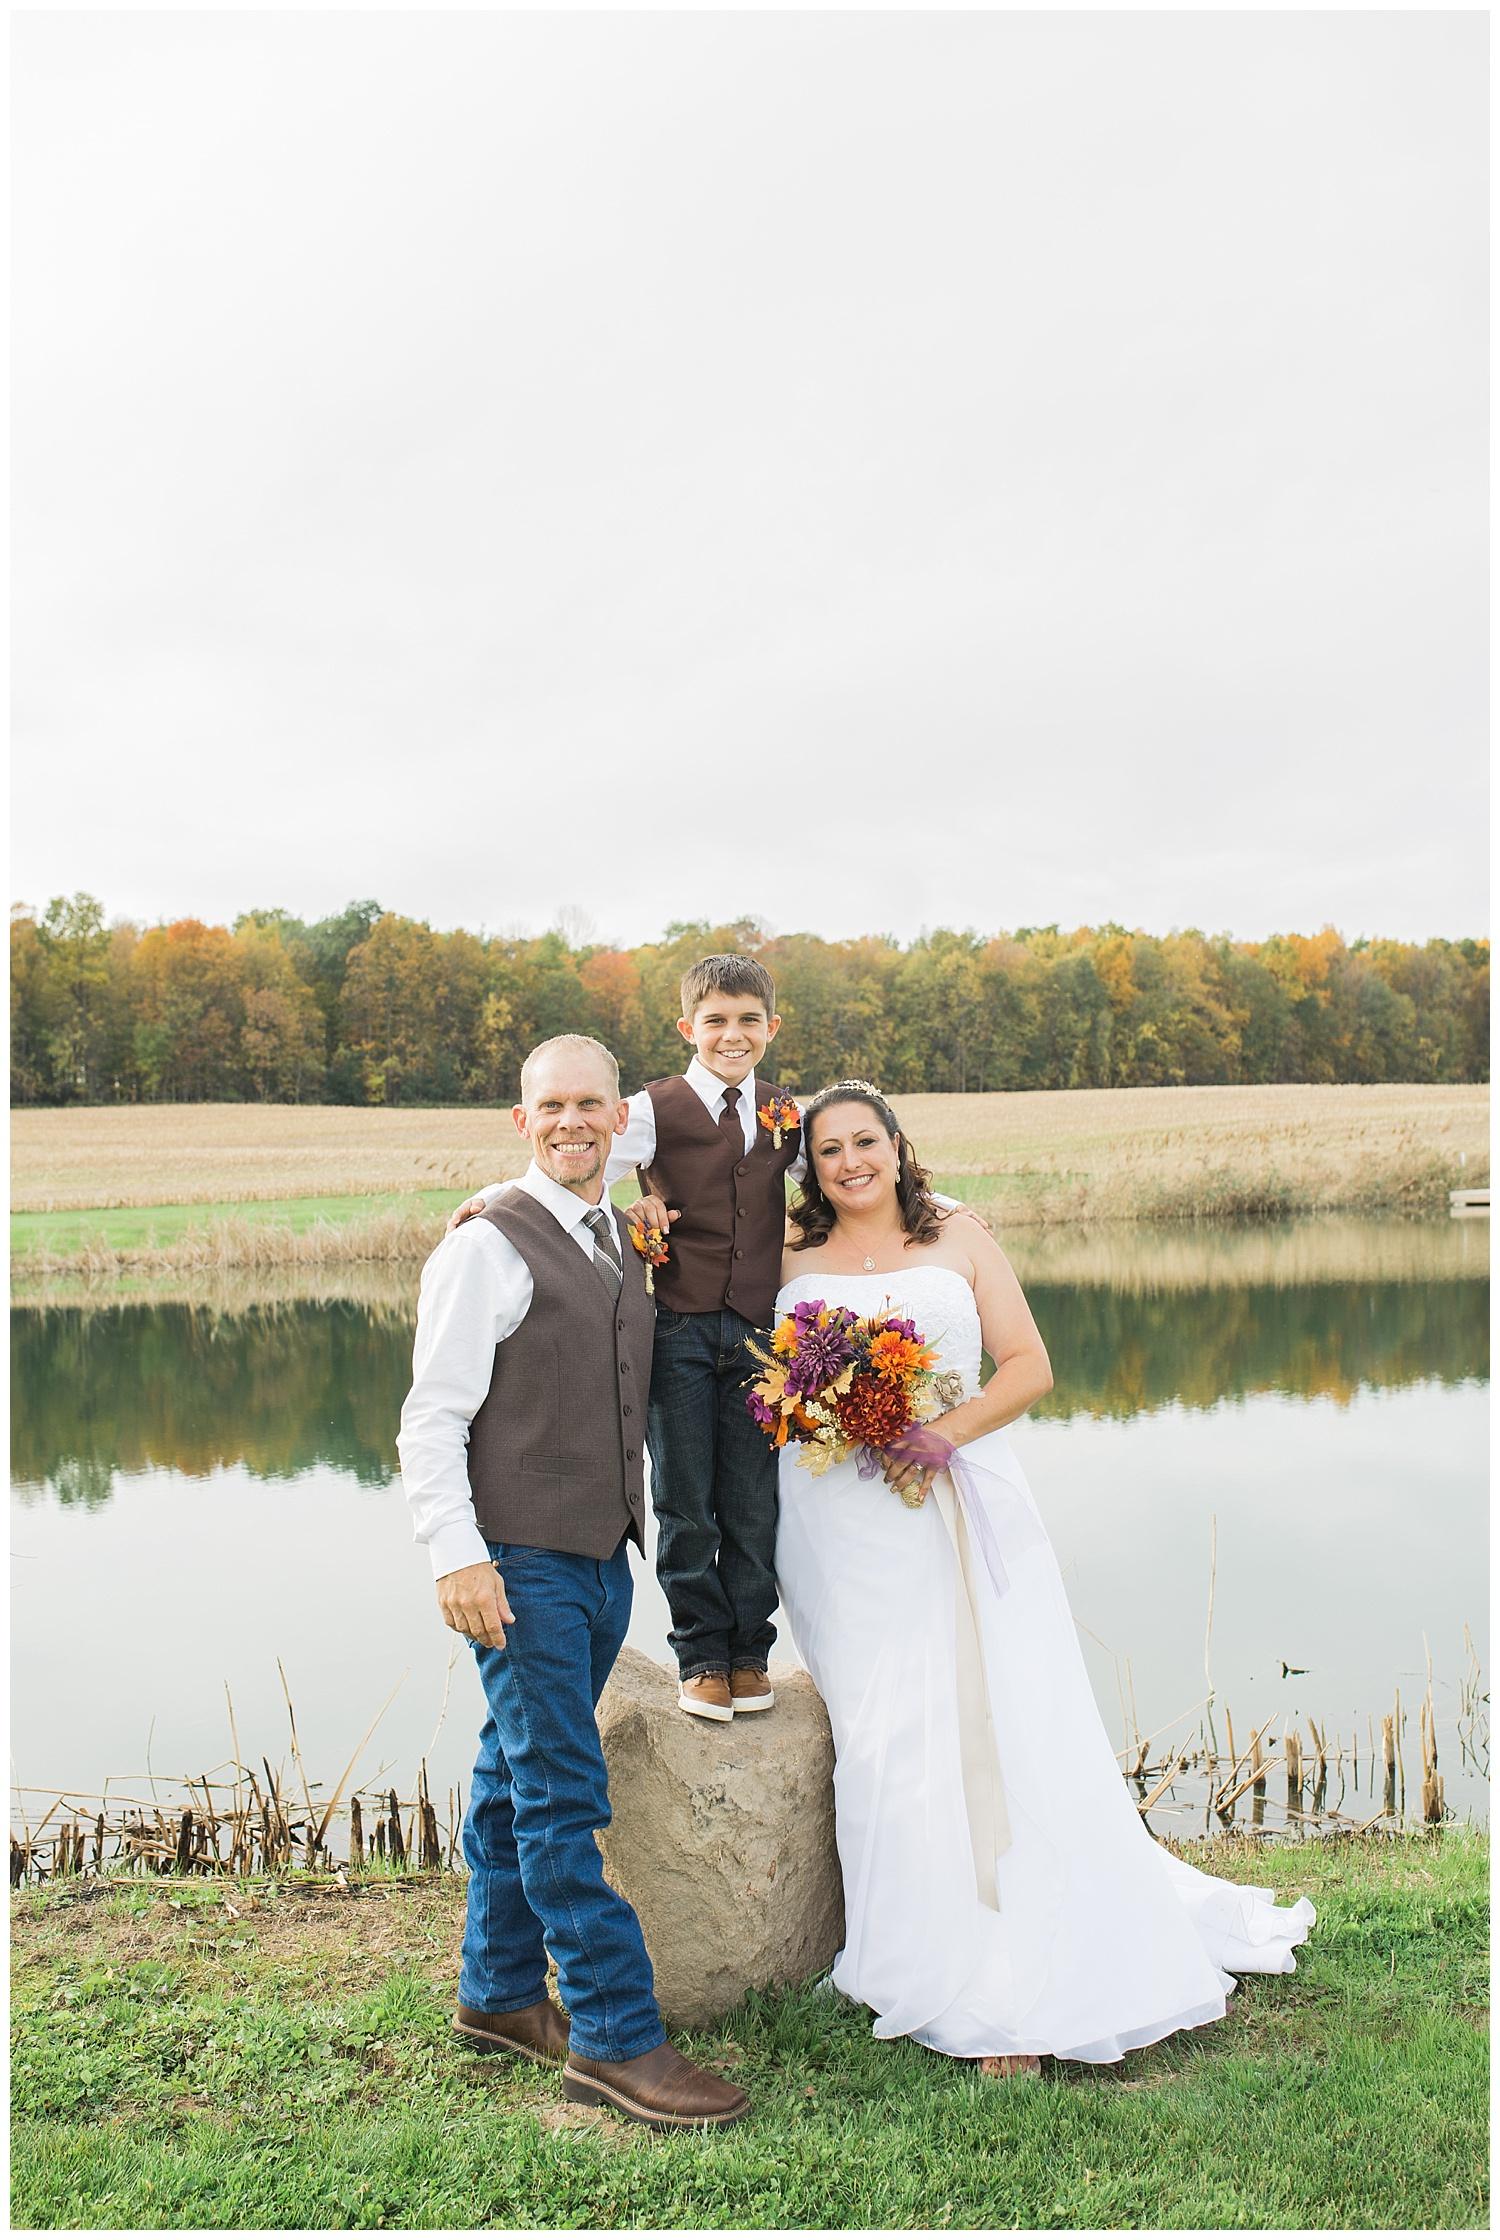 The Hall Wedding - York NY - Lass and Beau-748_Buffalo wedding photography.jpg